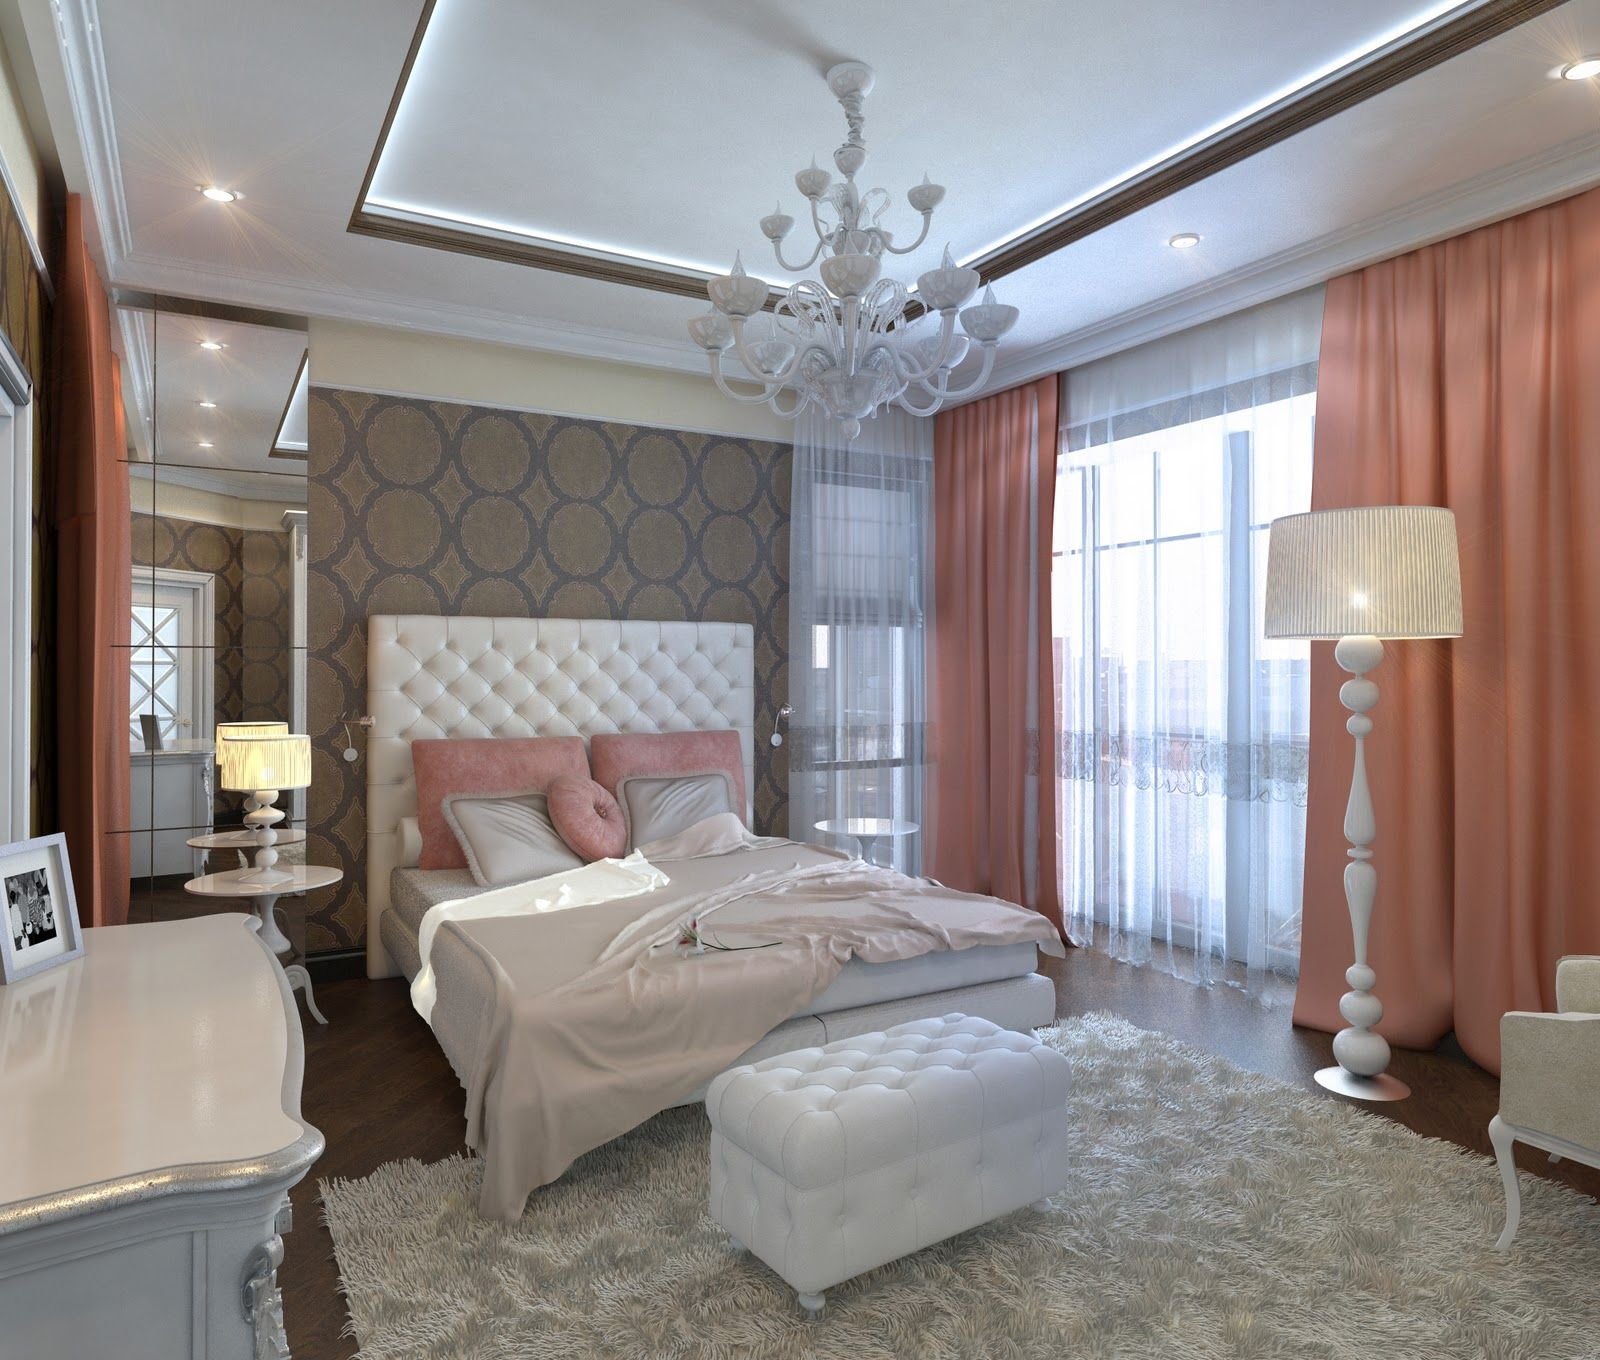 Art Of Bedroom Design Ideas 2017 2018 Pinterest Art